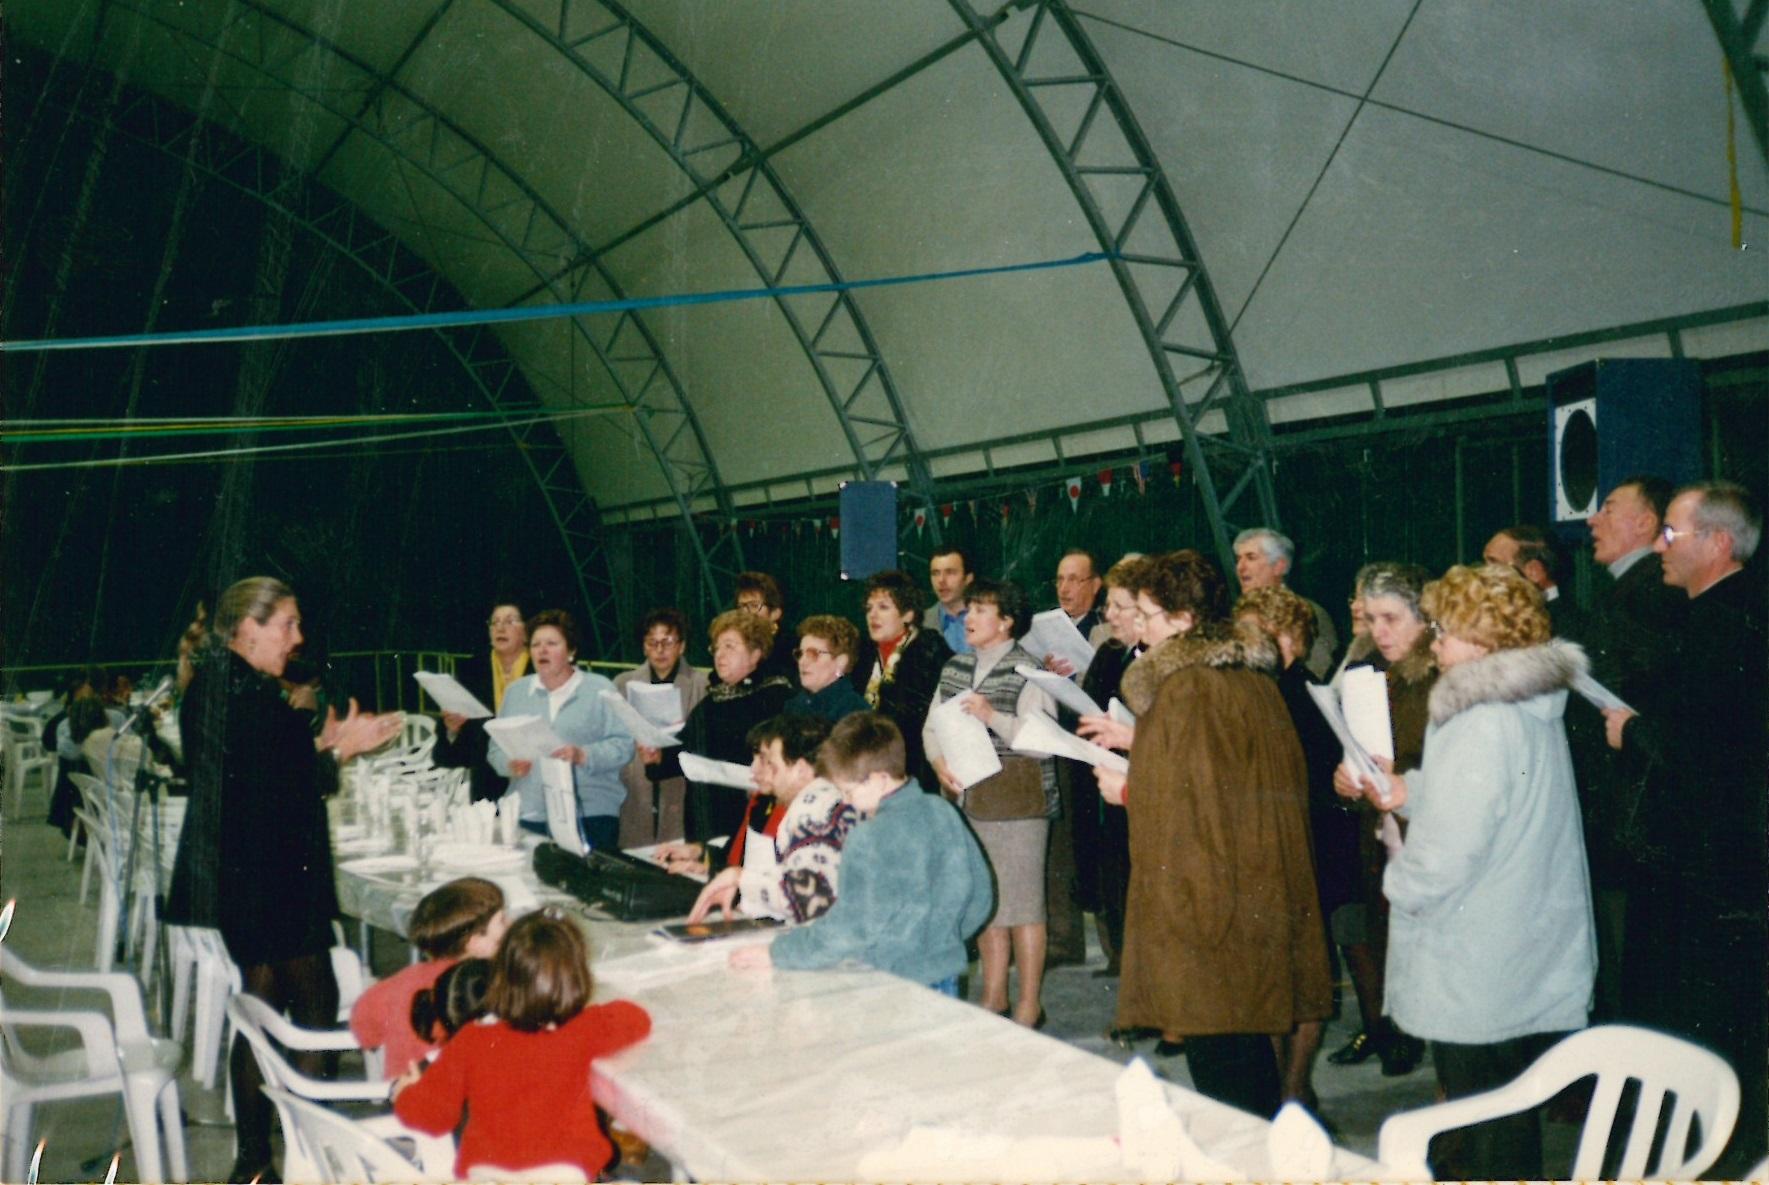 Recupero bambini di strada 9 Gennaio 1996